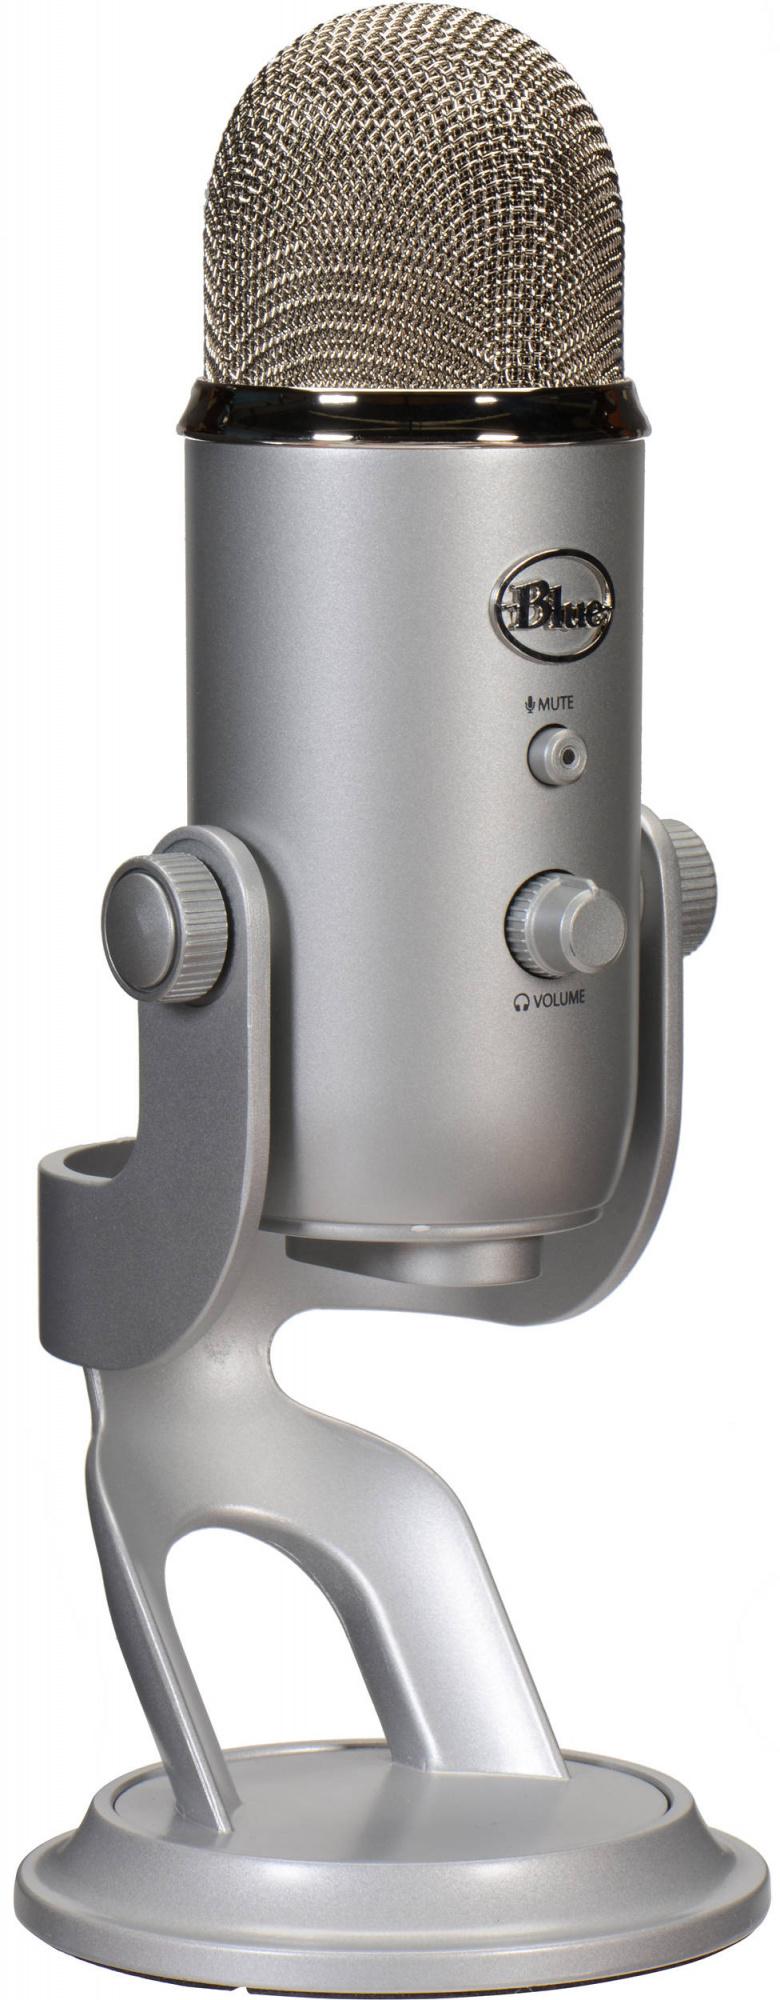 Blue Microphones Yeti Studio - конденсаторный микрофон (Silver)